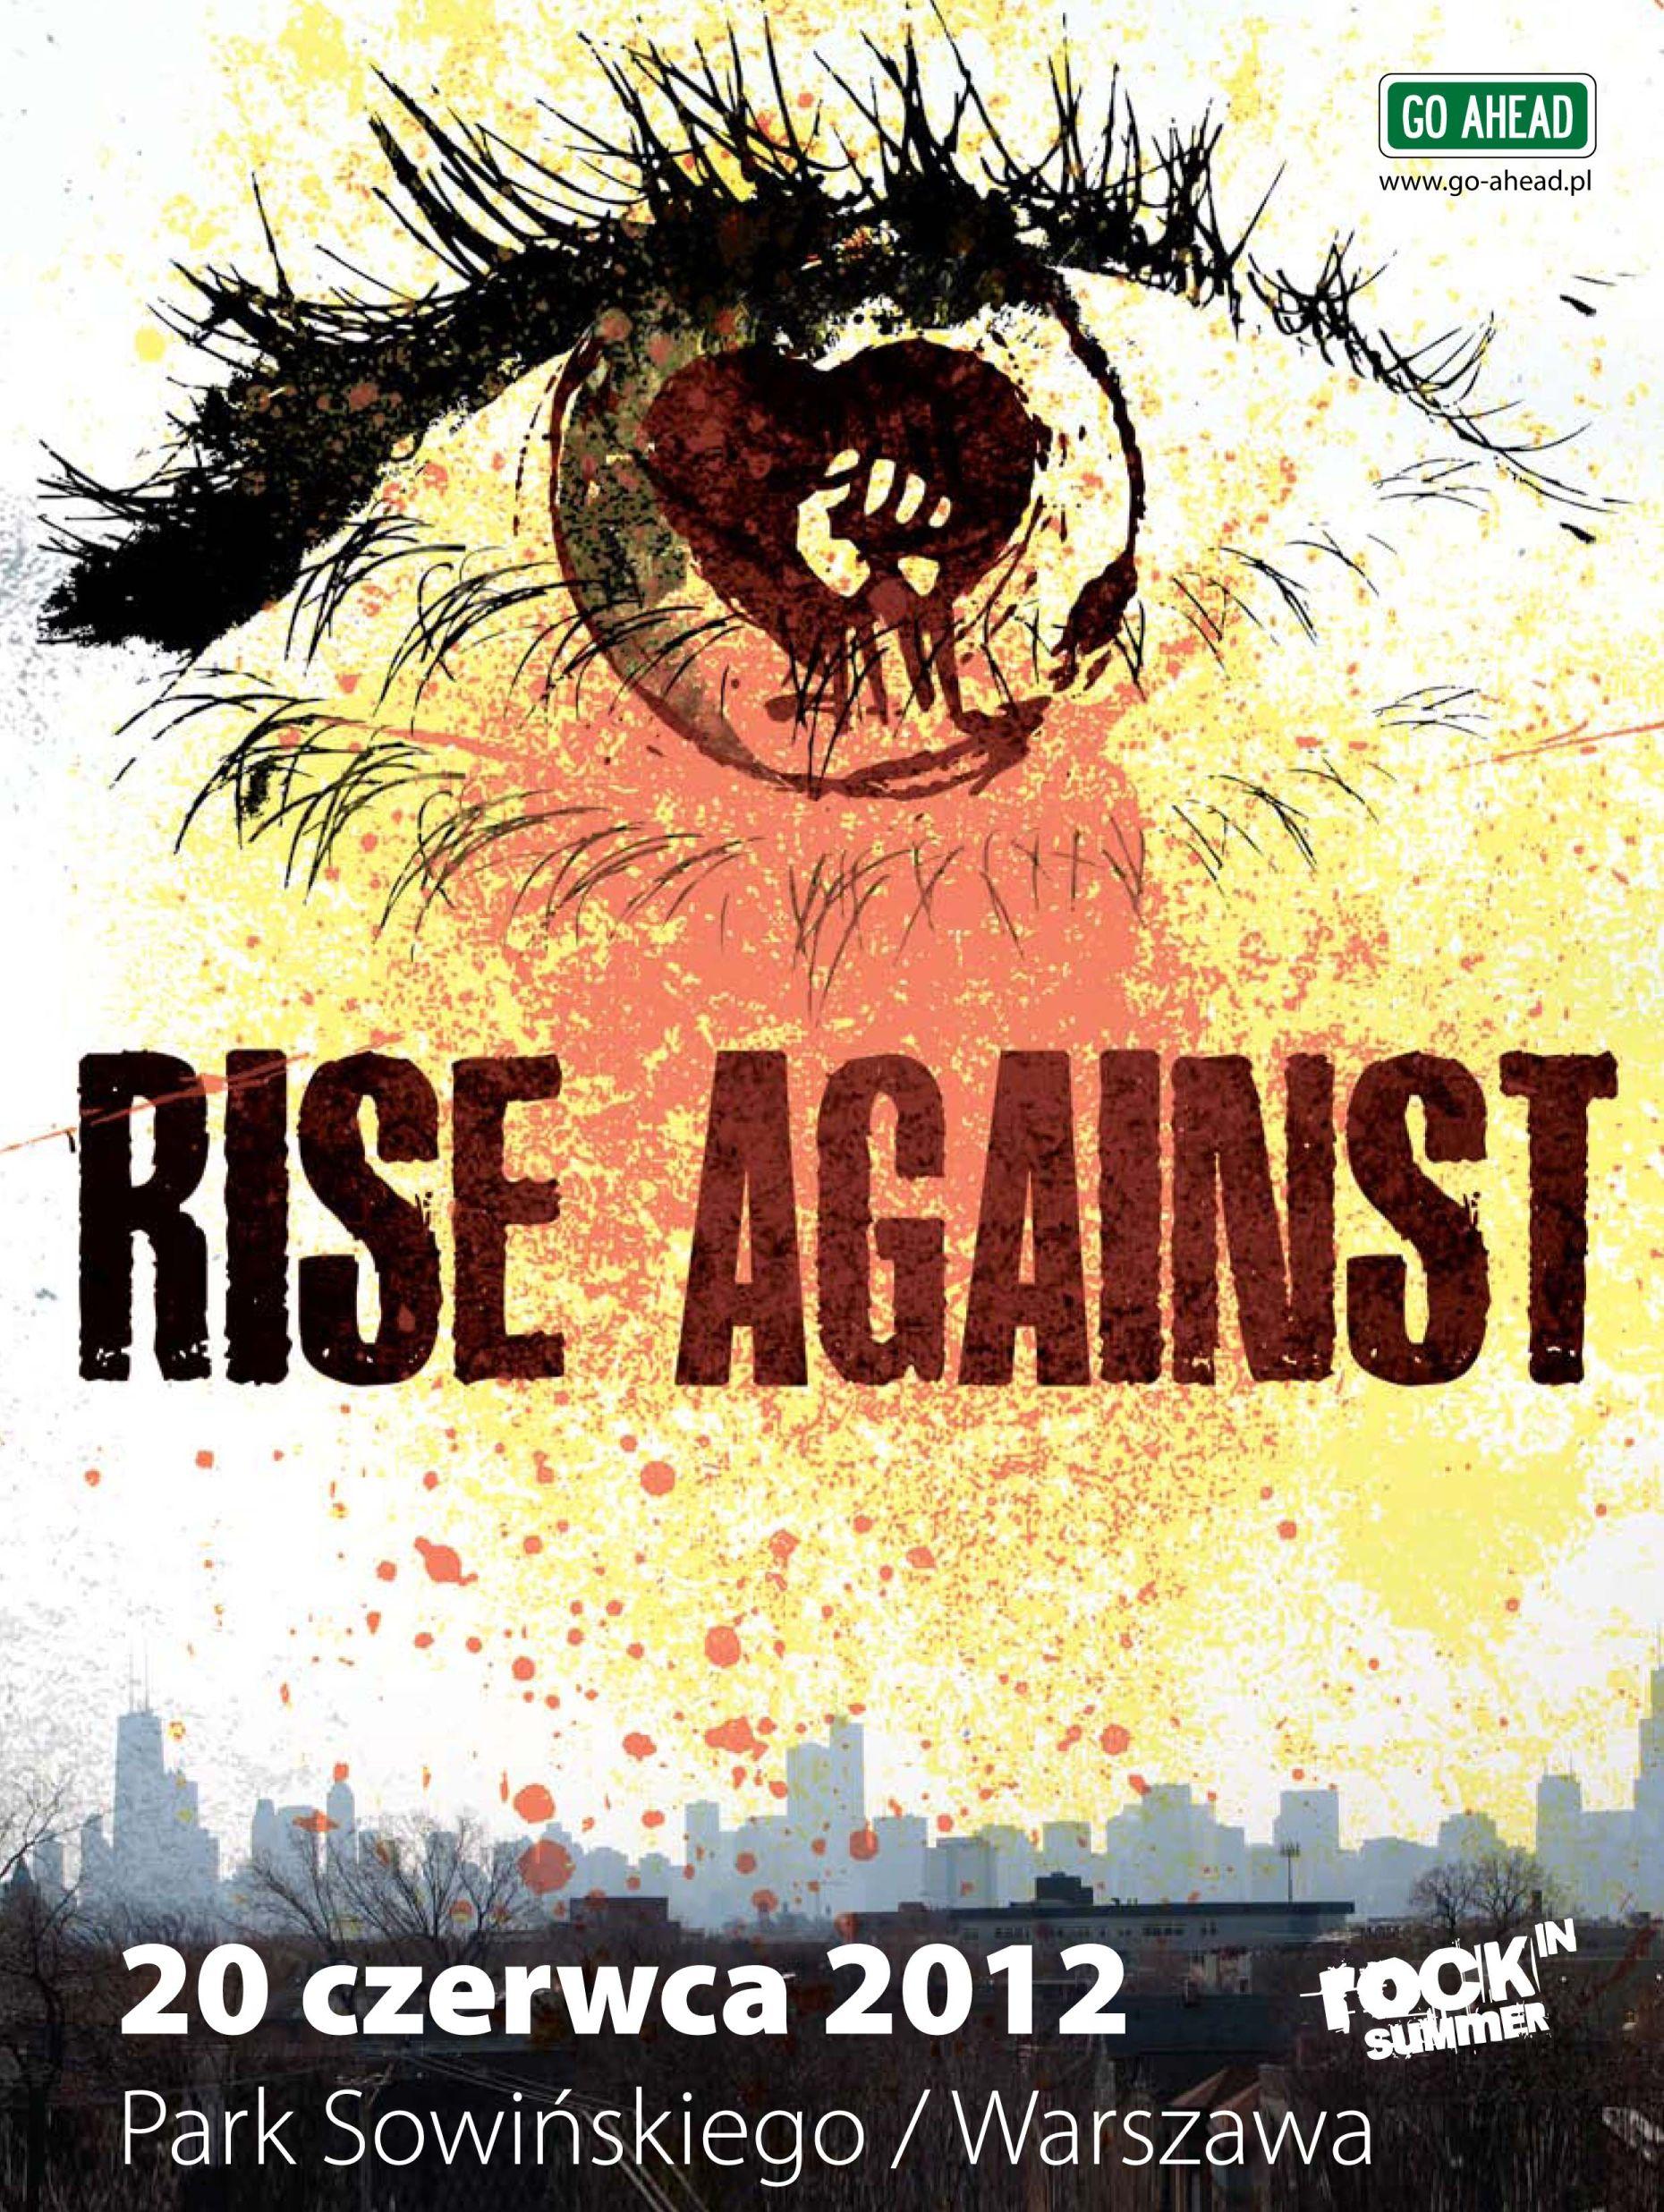 Plakat koncertu Rise Against (źródło: materiał prasowy organizatora)